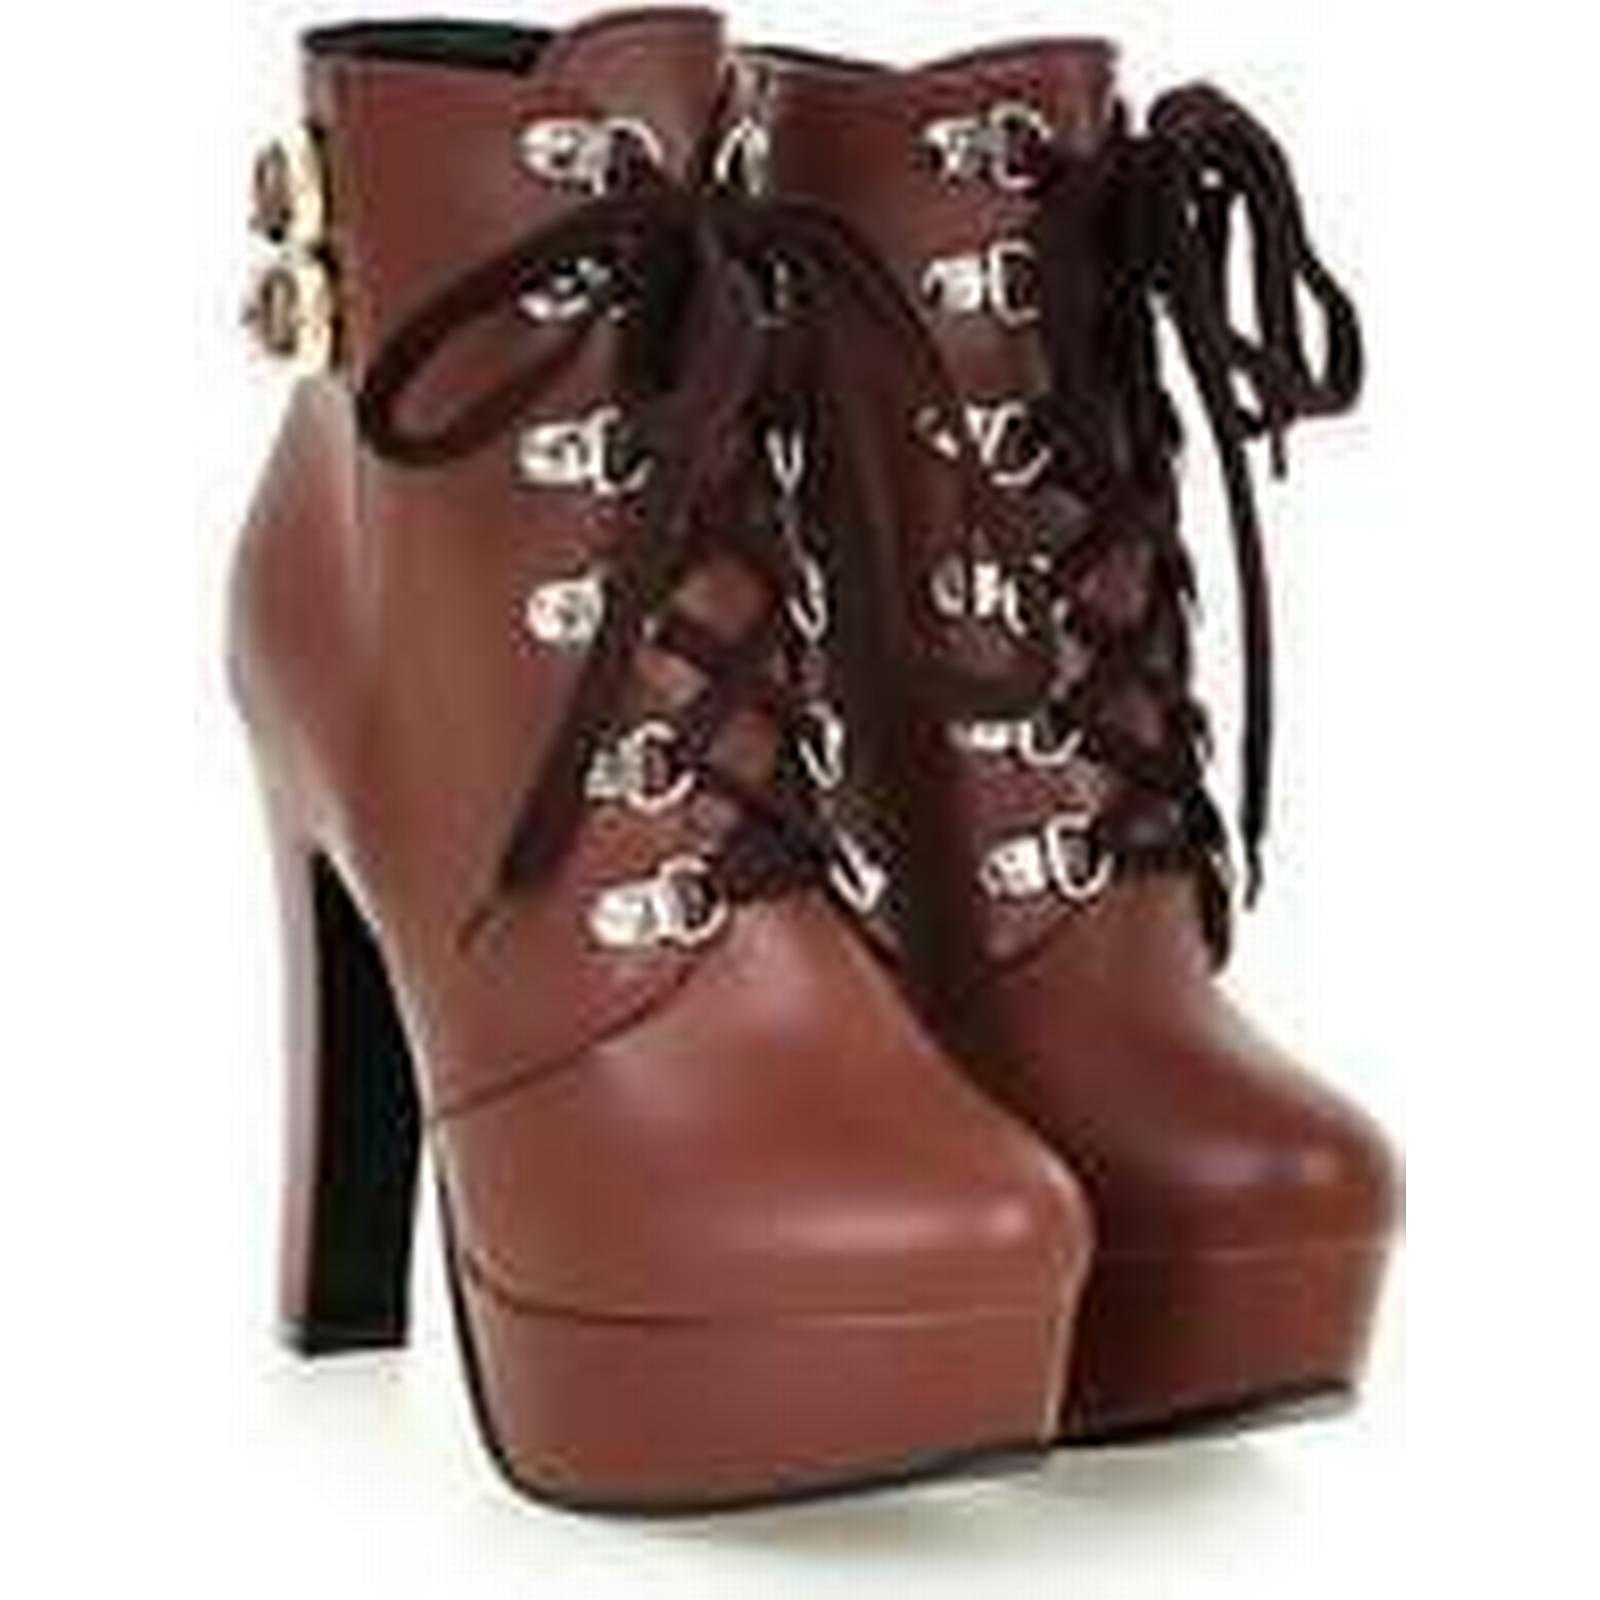 Bonanza (Global) PB106 size Stunning buckles booties,US size PB106 4-9, brown 7670f1